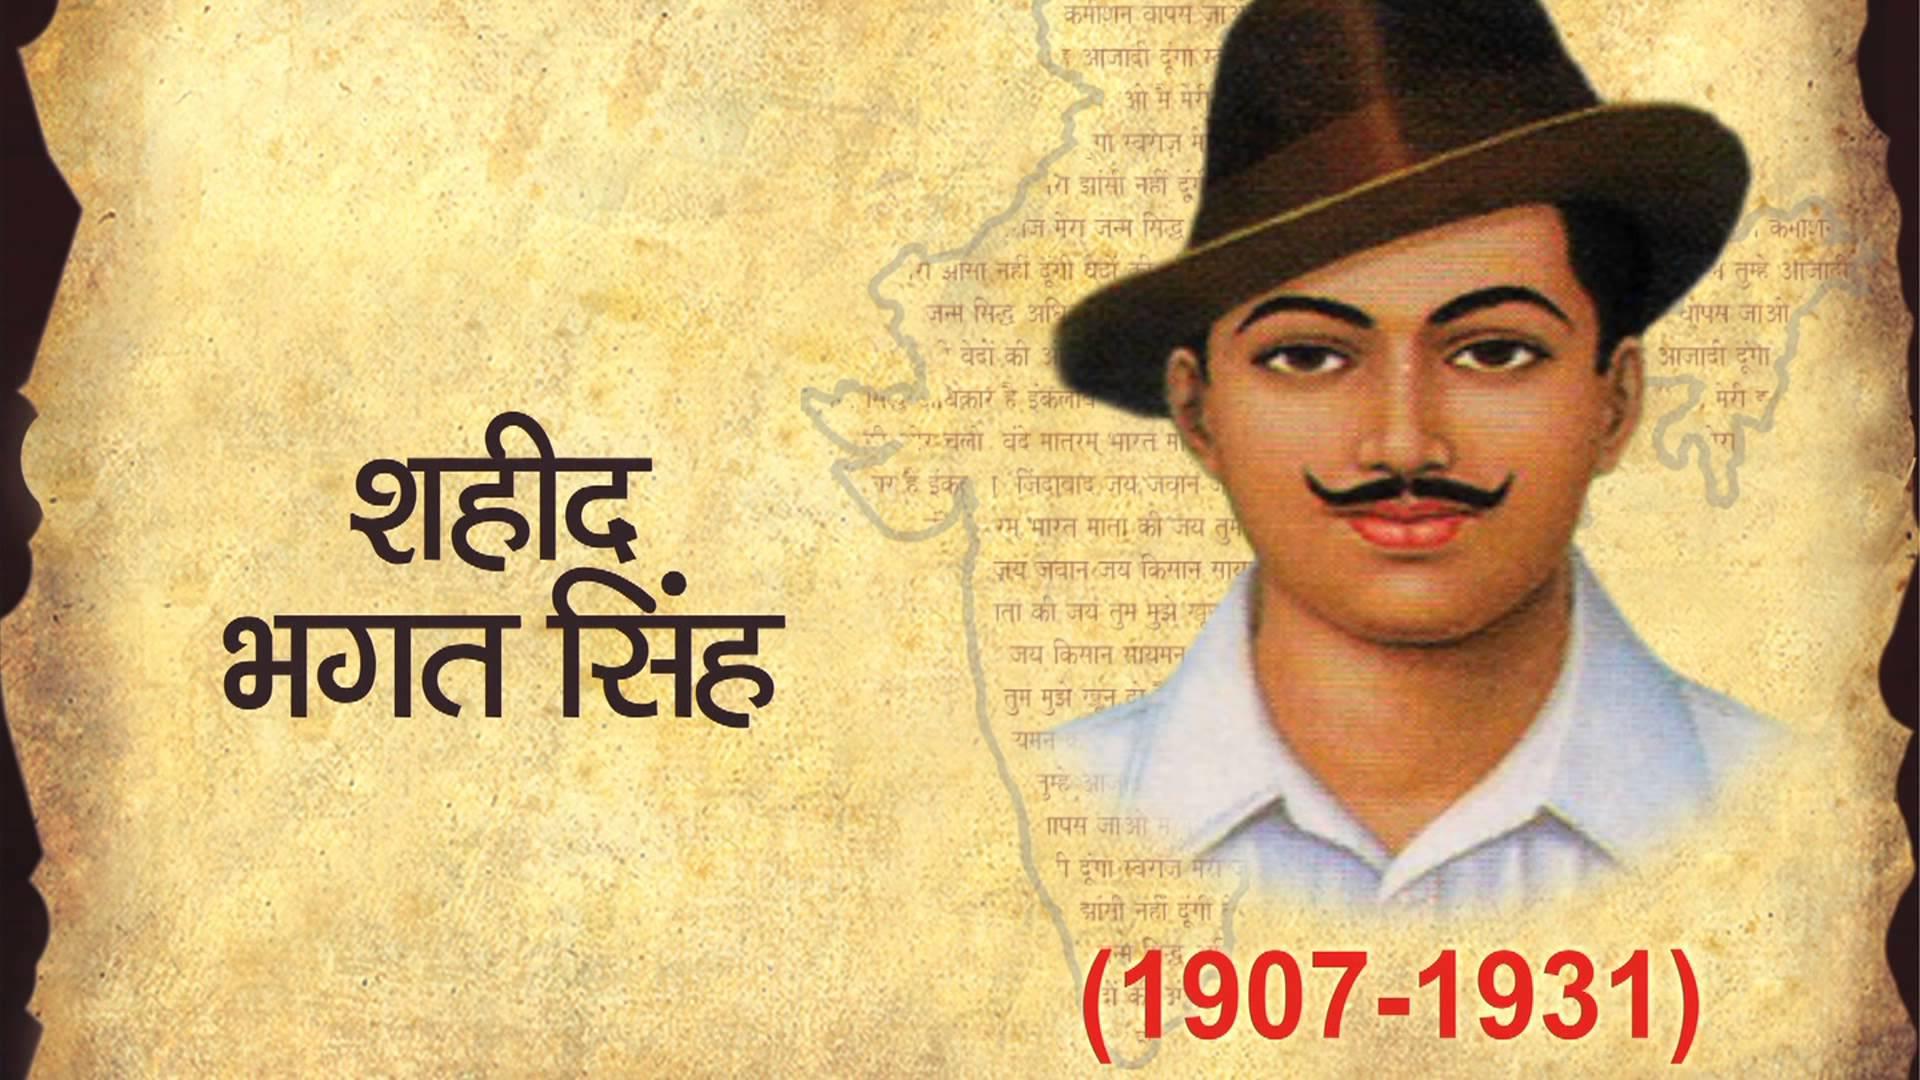 shahid bhagat singh biography